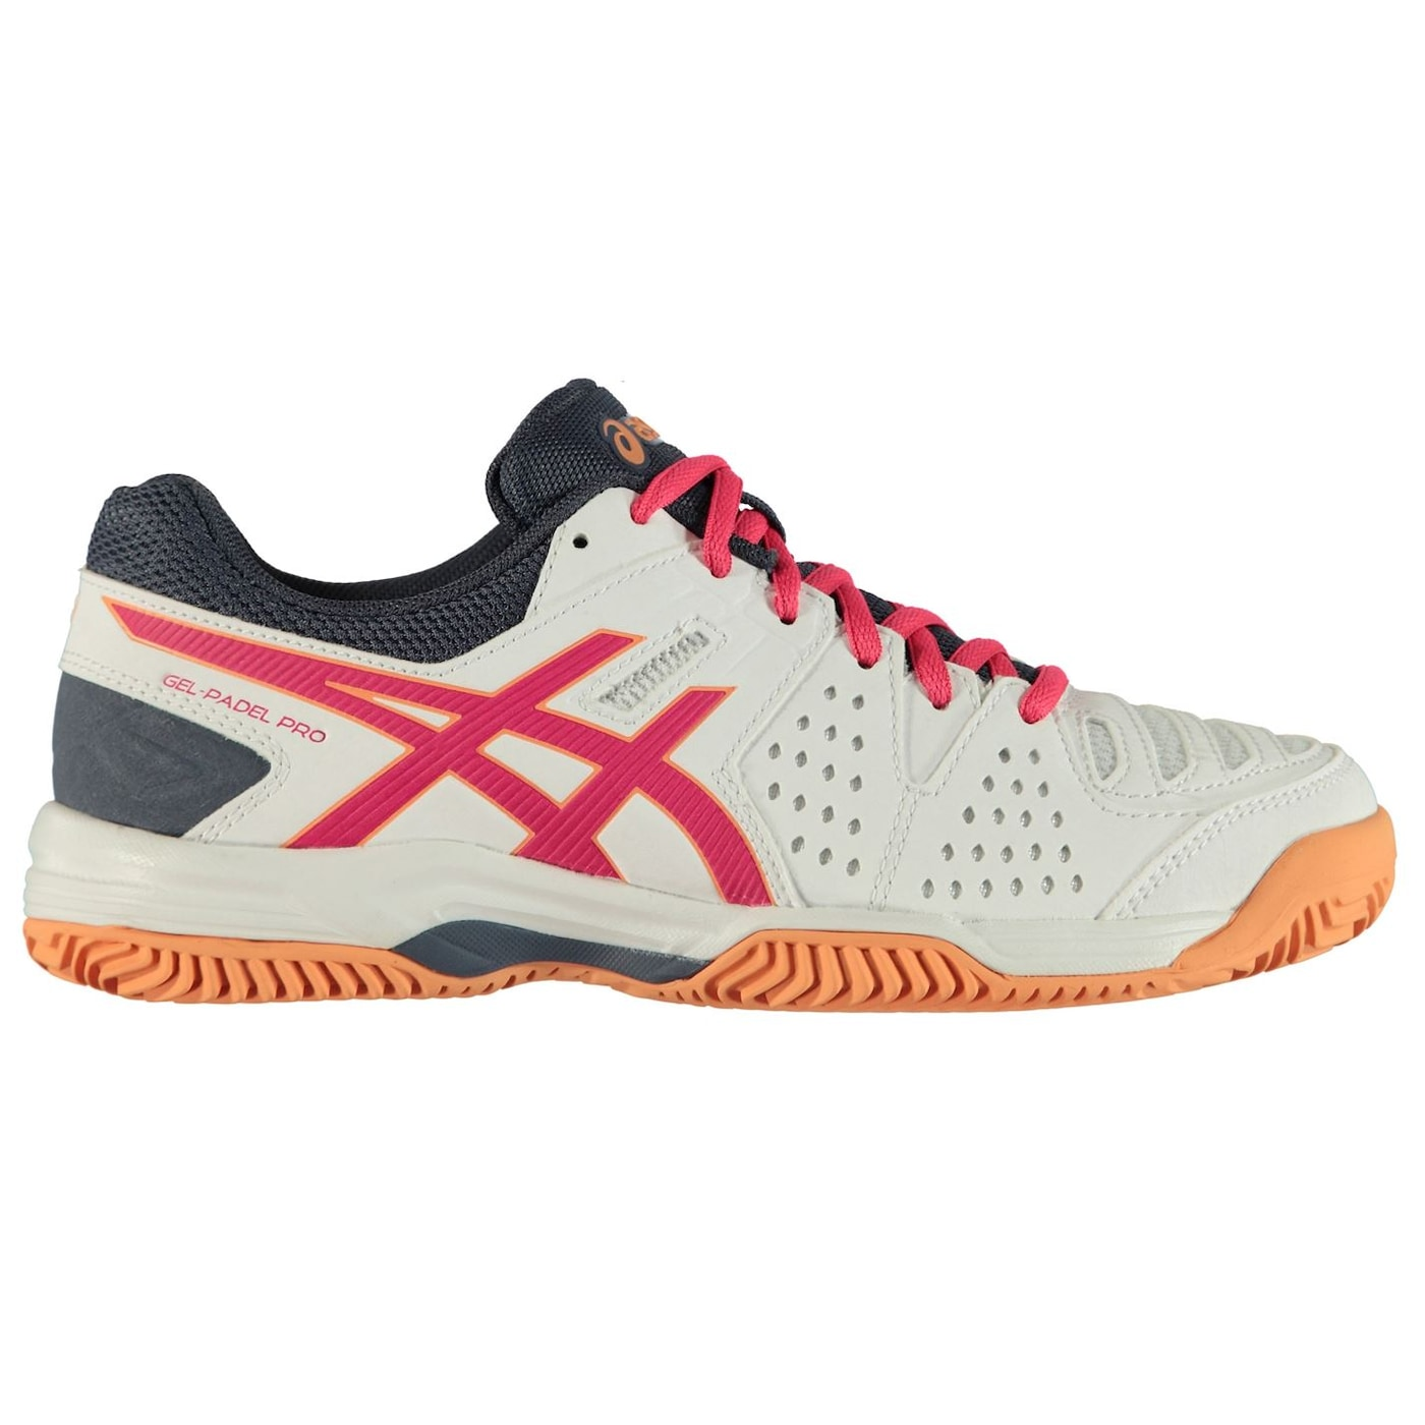 Asics Gel Padel Pro 3 SG Mens Tennis Shoes